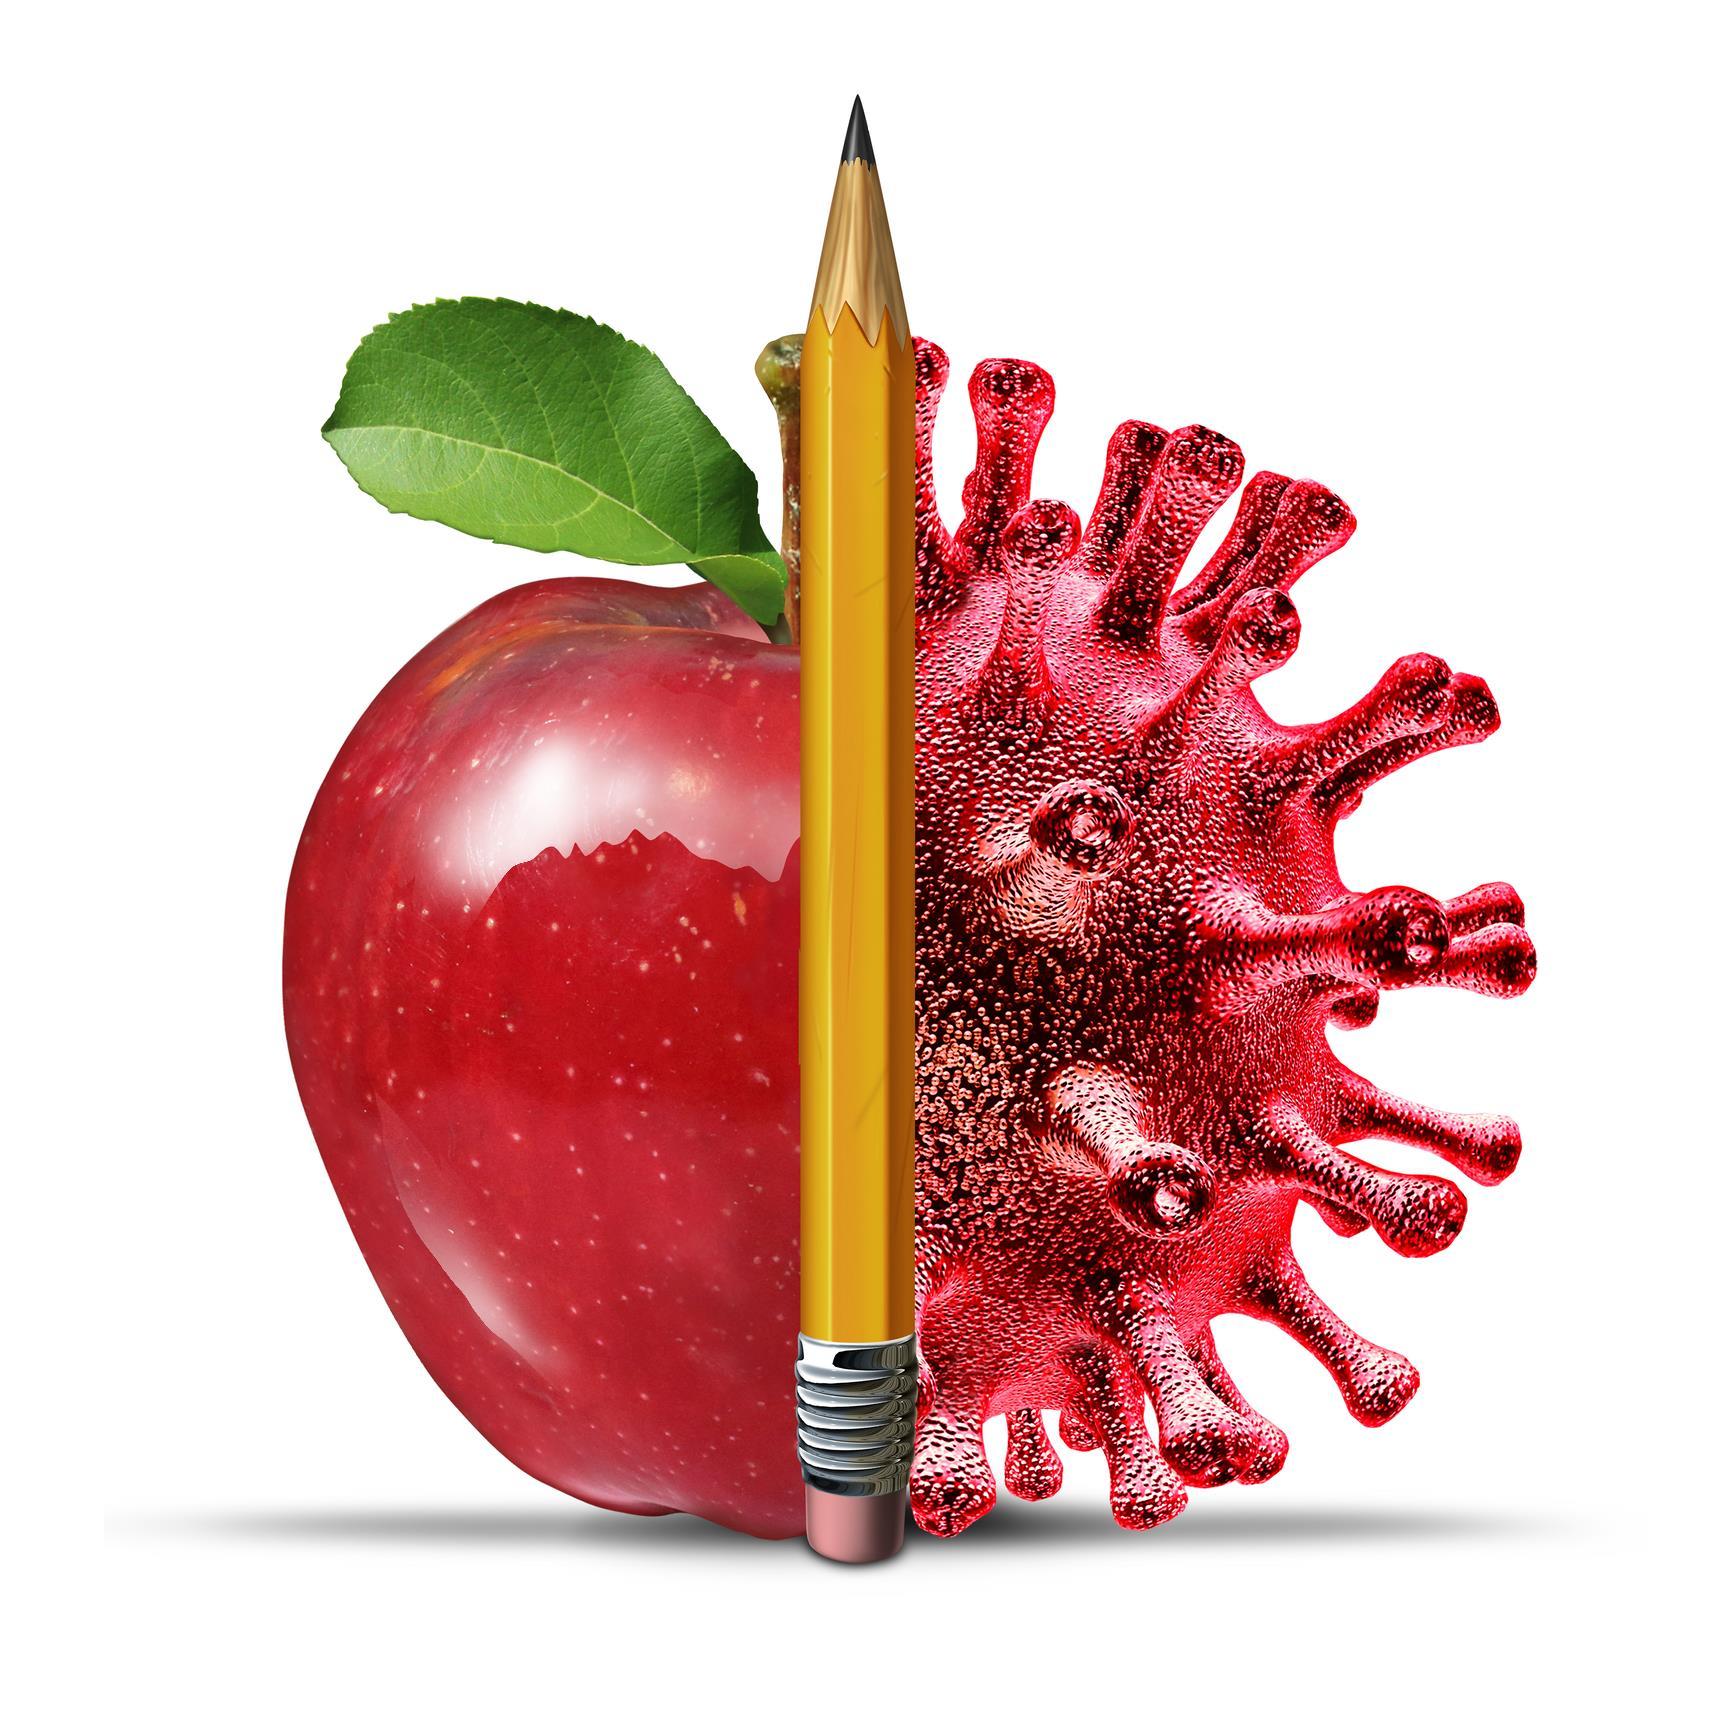 apple, pencil and covid molecule